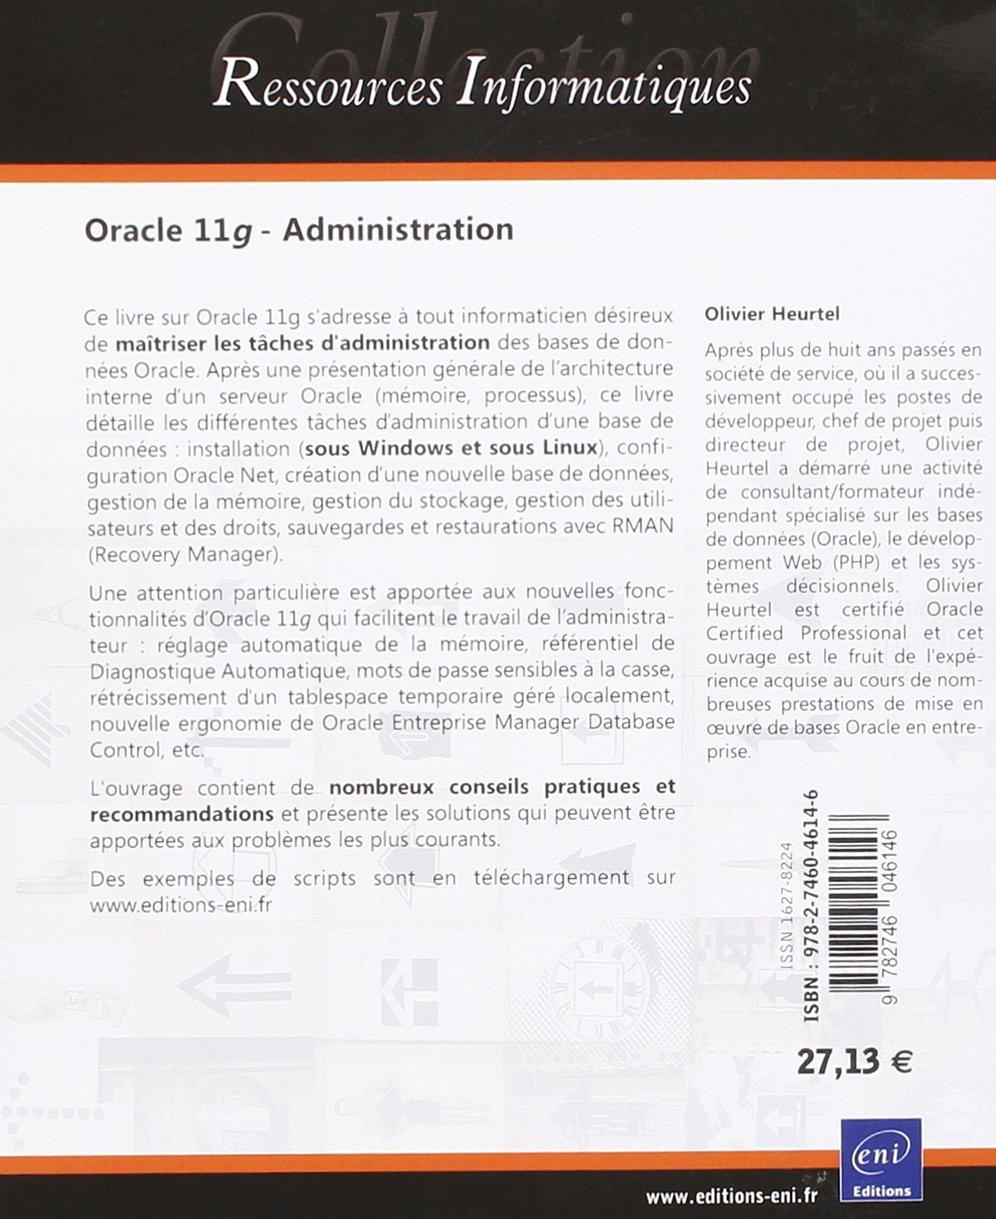 oracle 11g administration de olivier heurtel